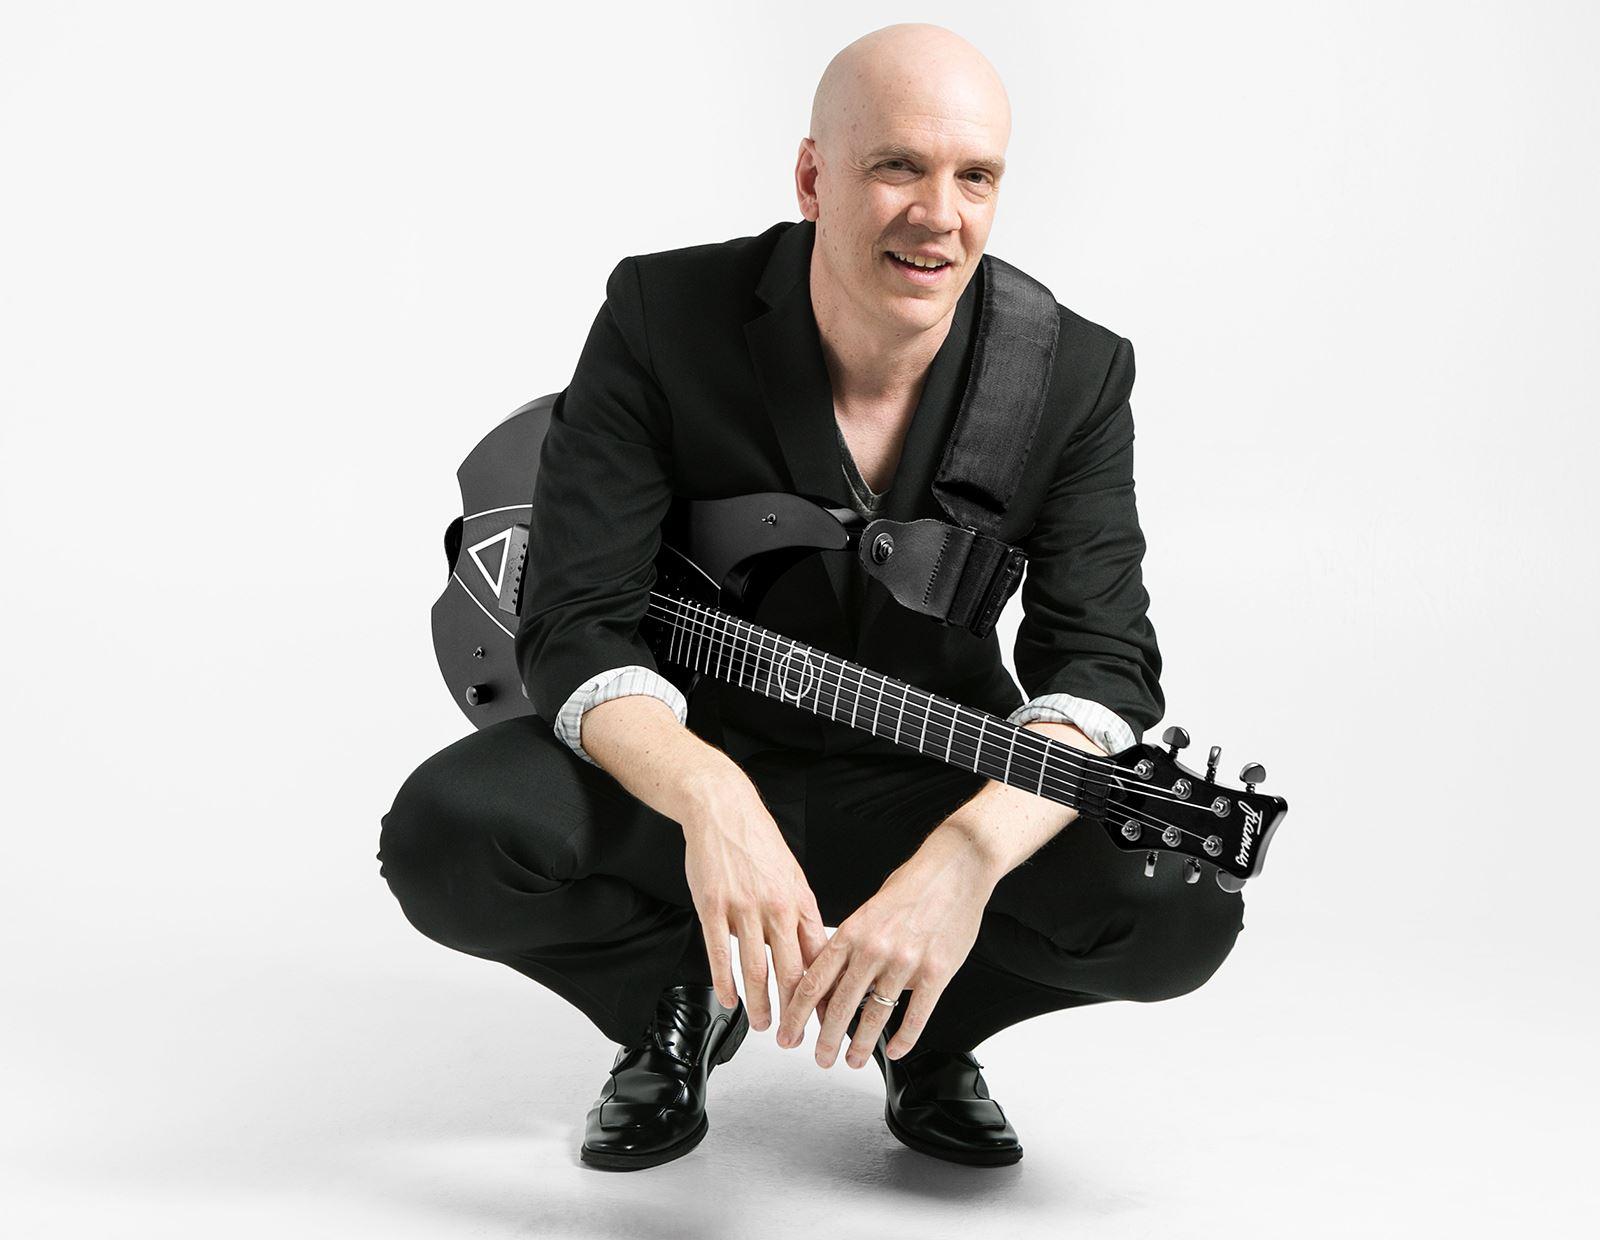 Events: Devin Townsend Clinic at guitarguitar Camden